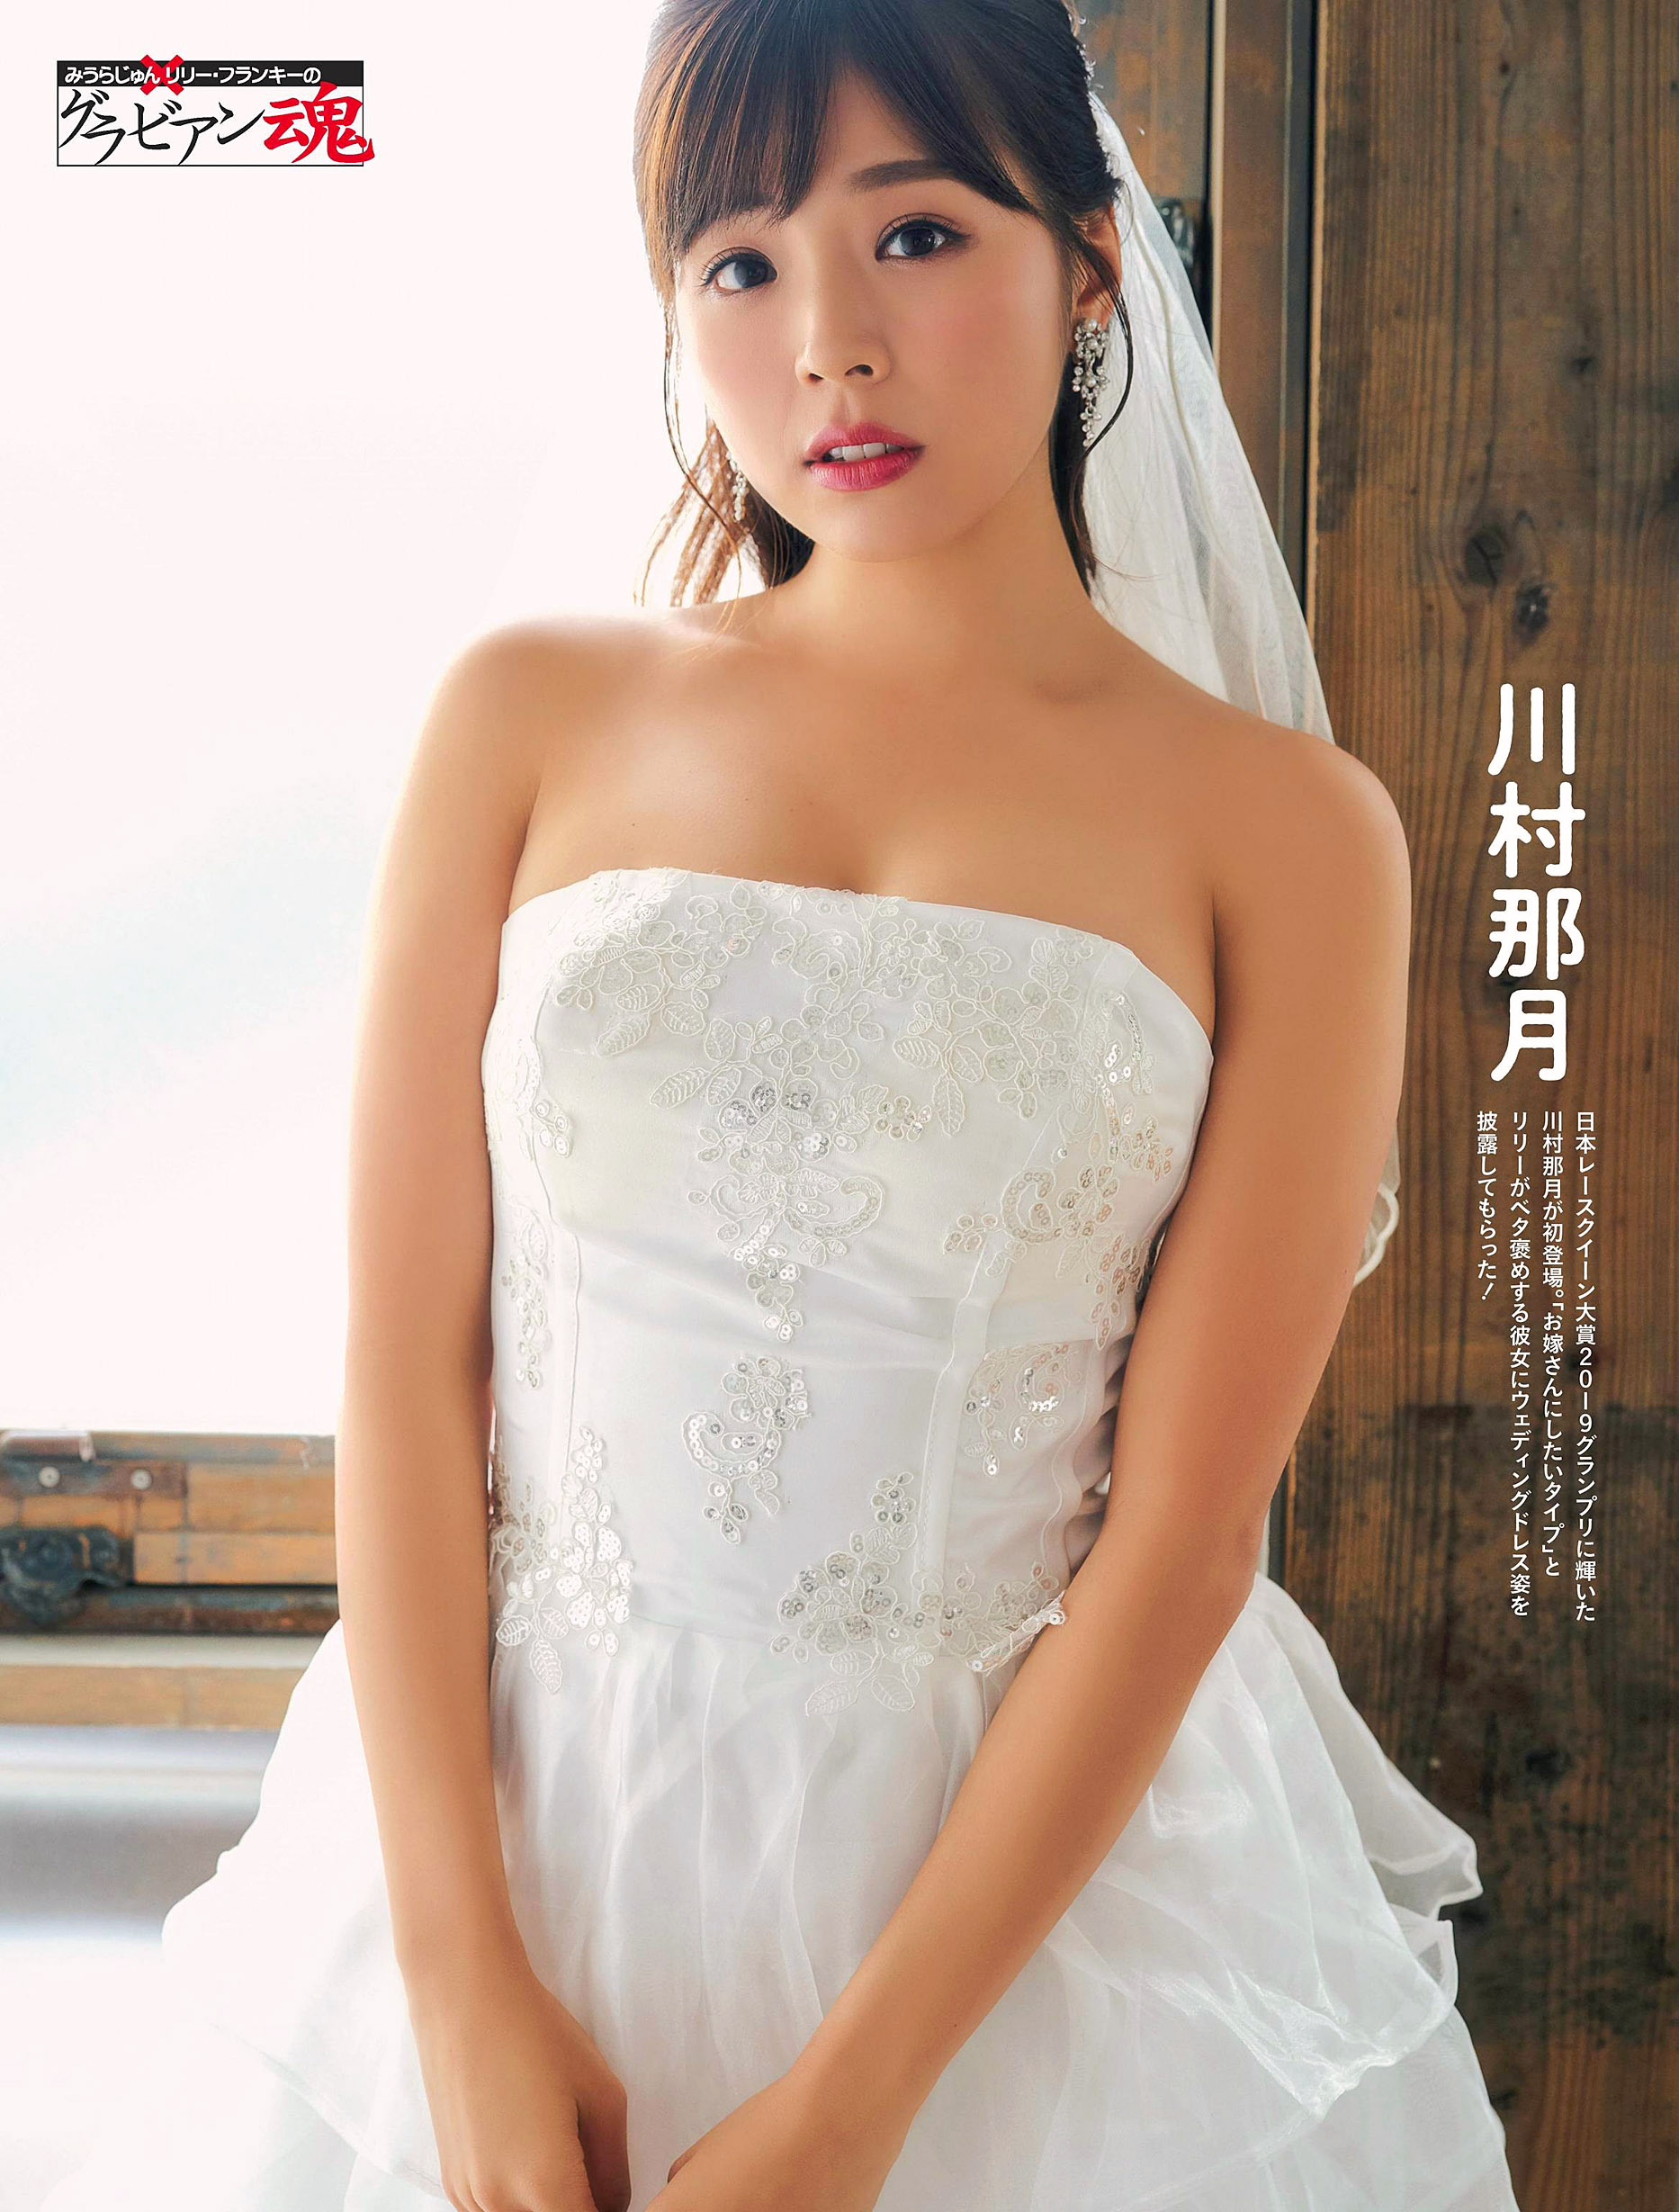 Natsuki Kawamura Weekly SPA 200204 01.jpg